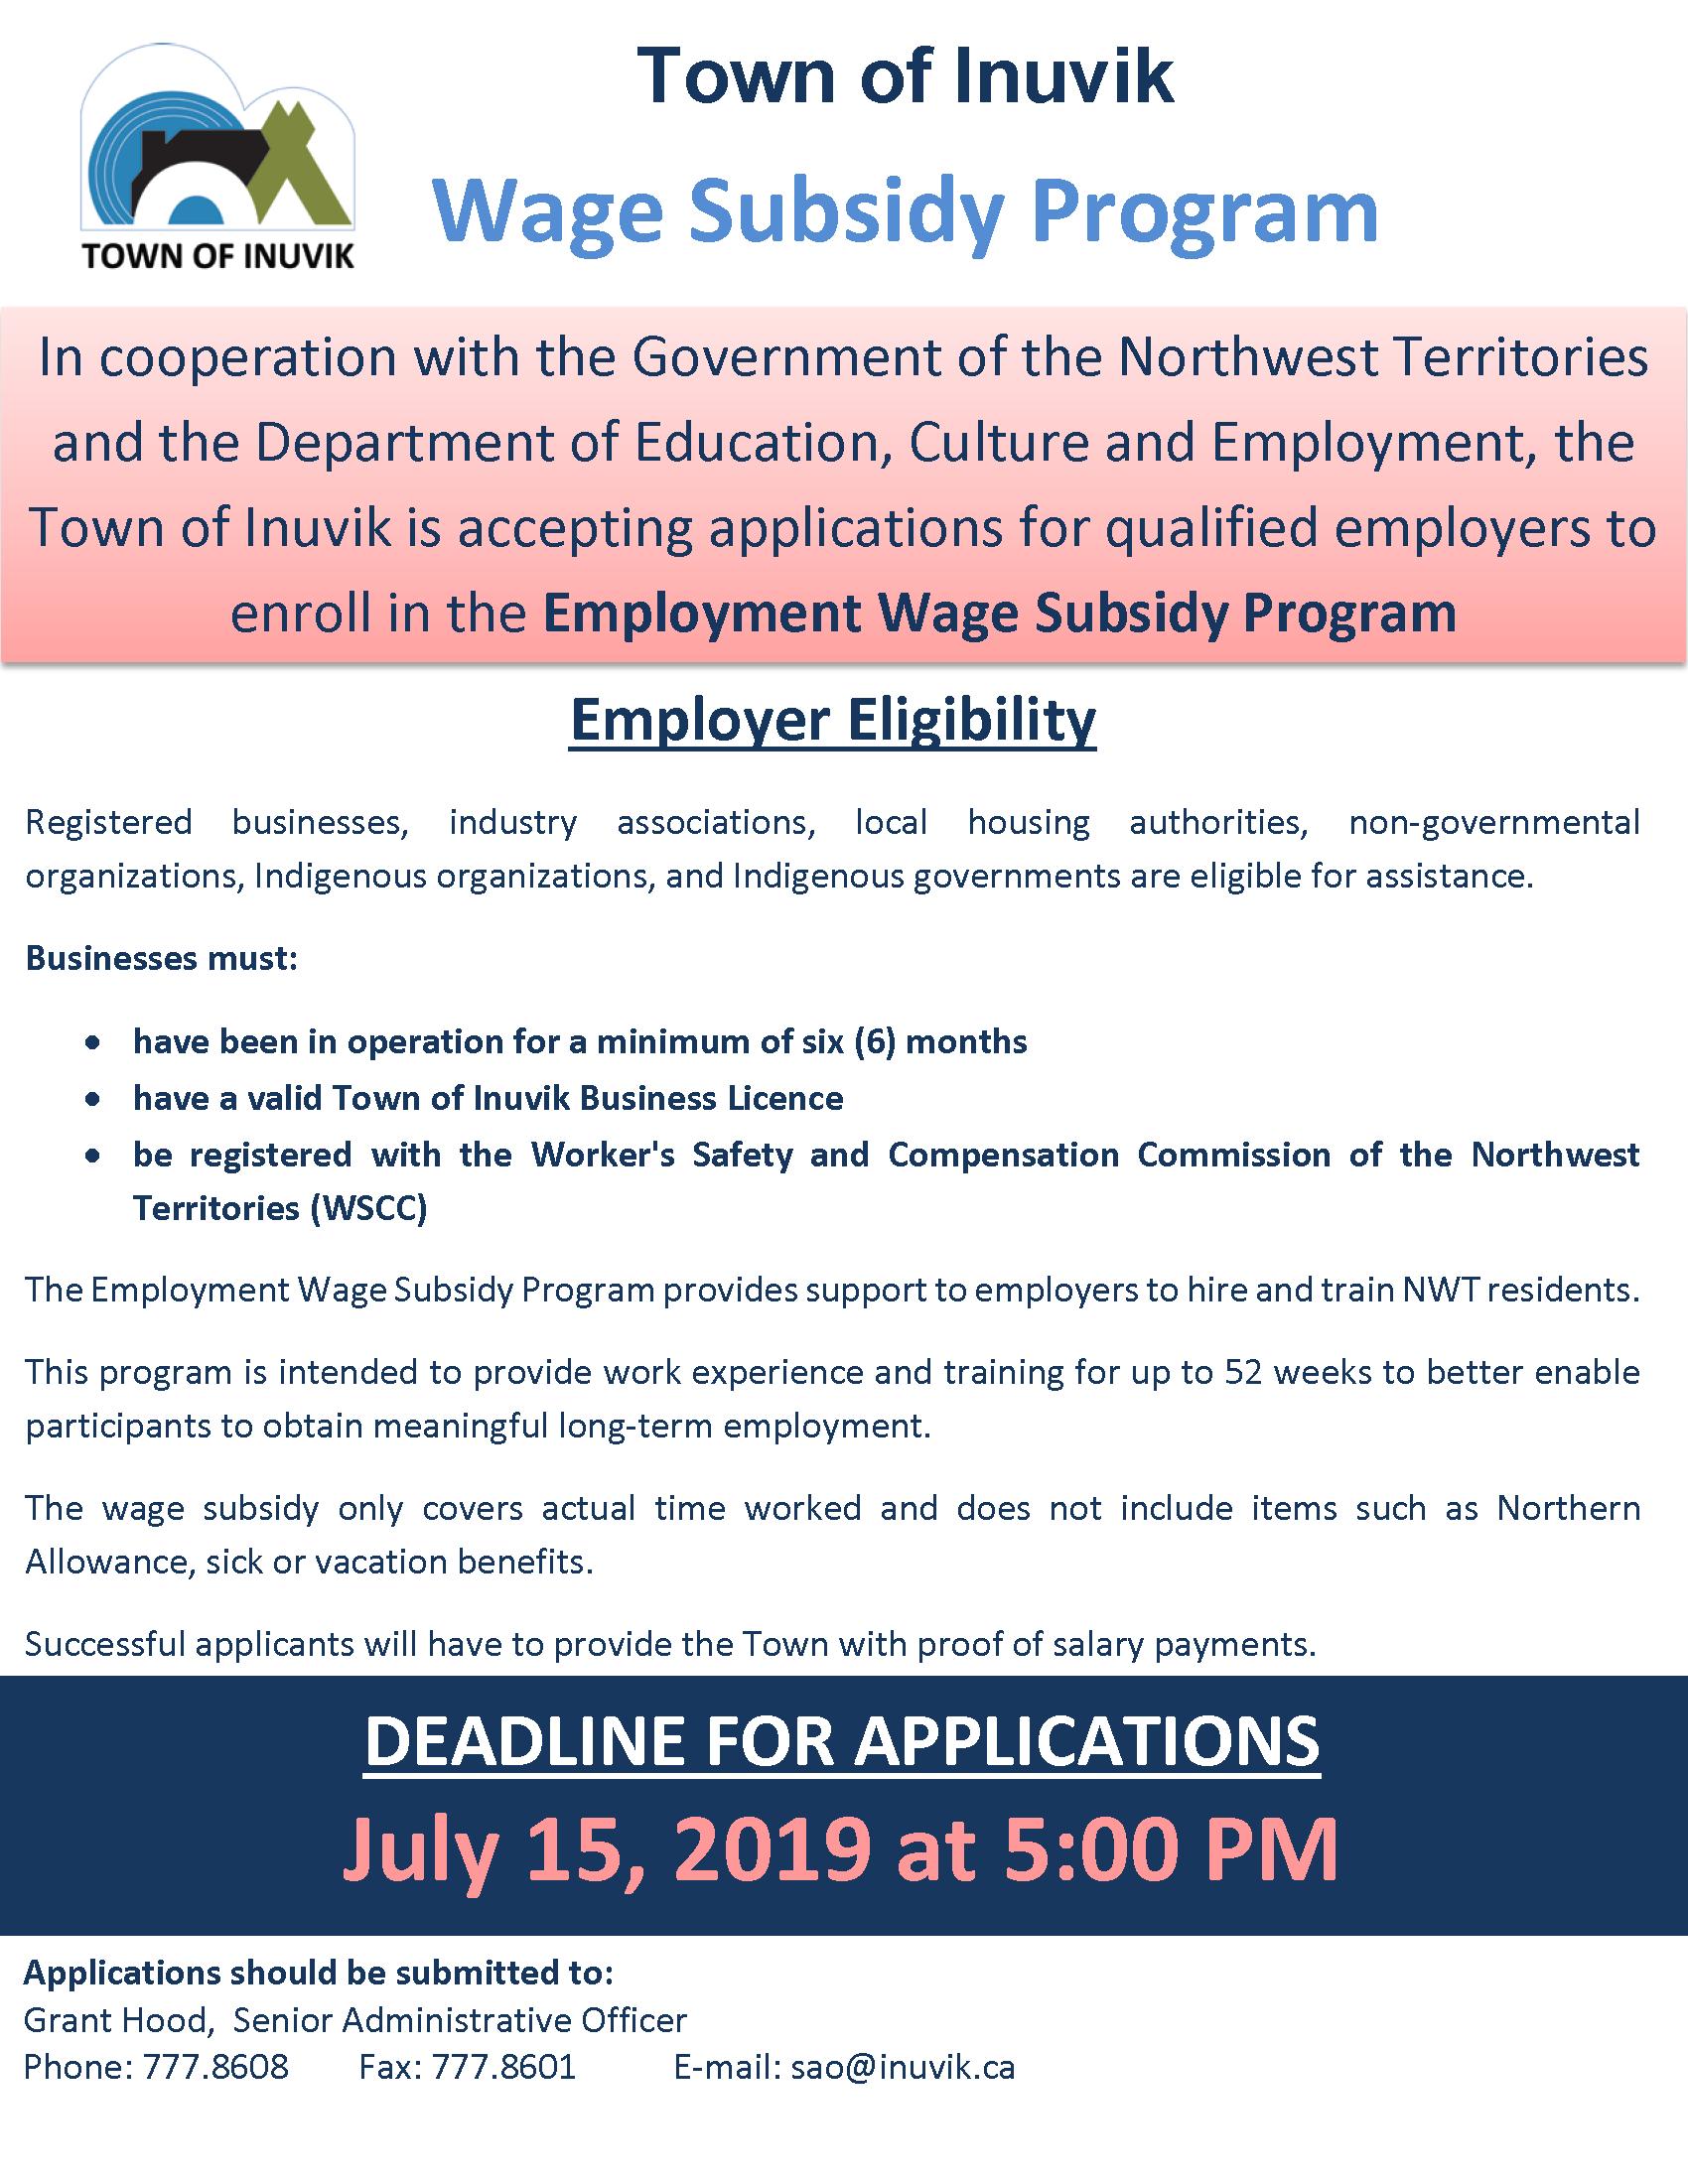 Wage Subsidy Program Information